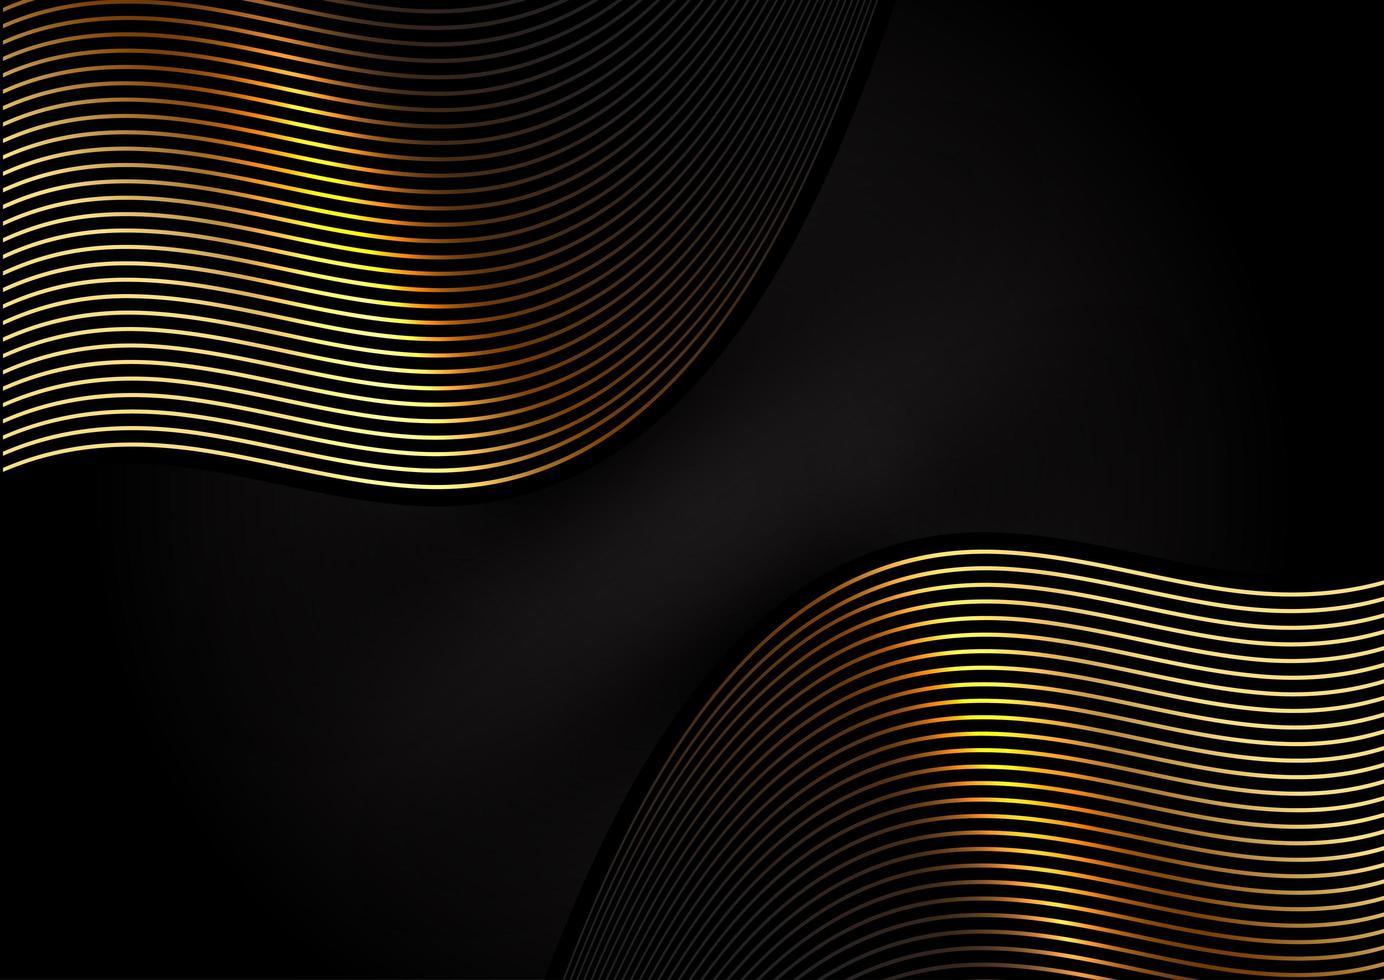 elegantes fließendes Goldliniendesign vektor